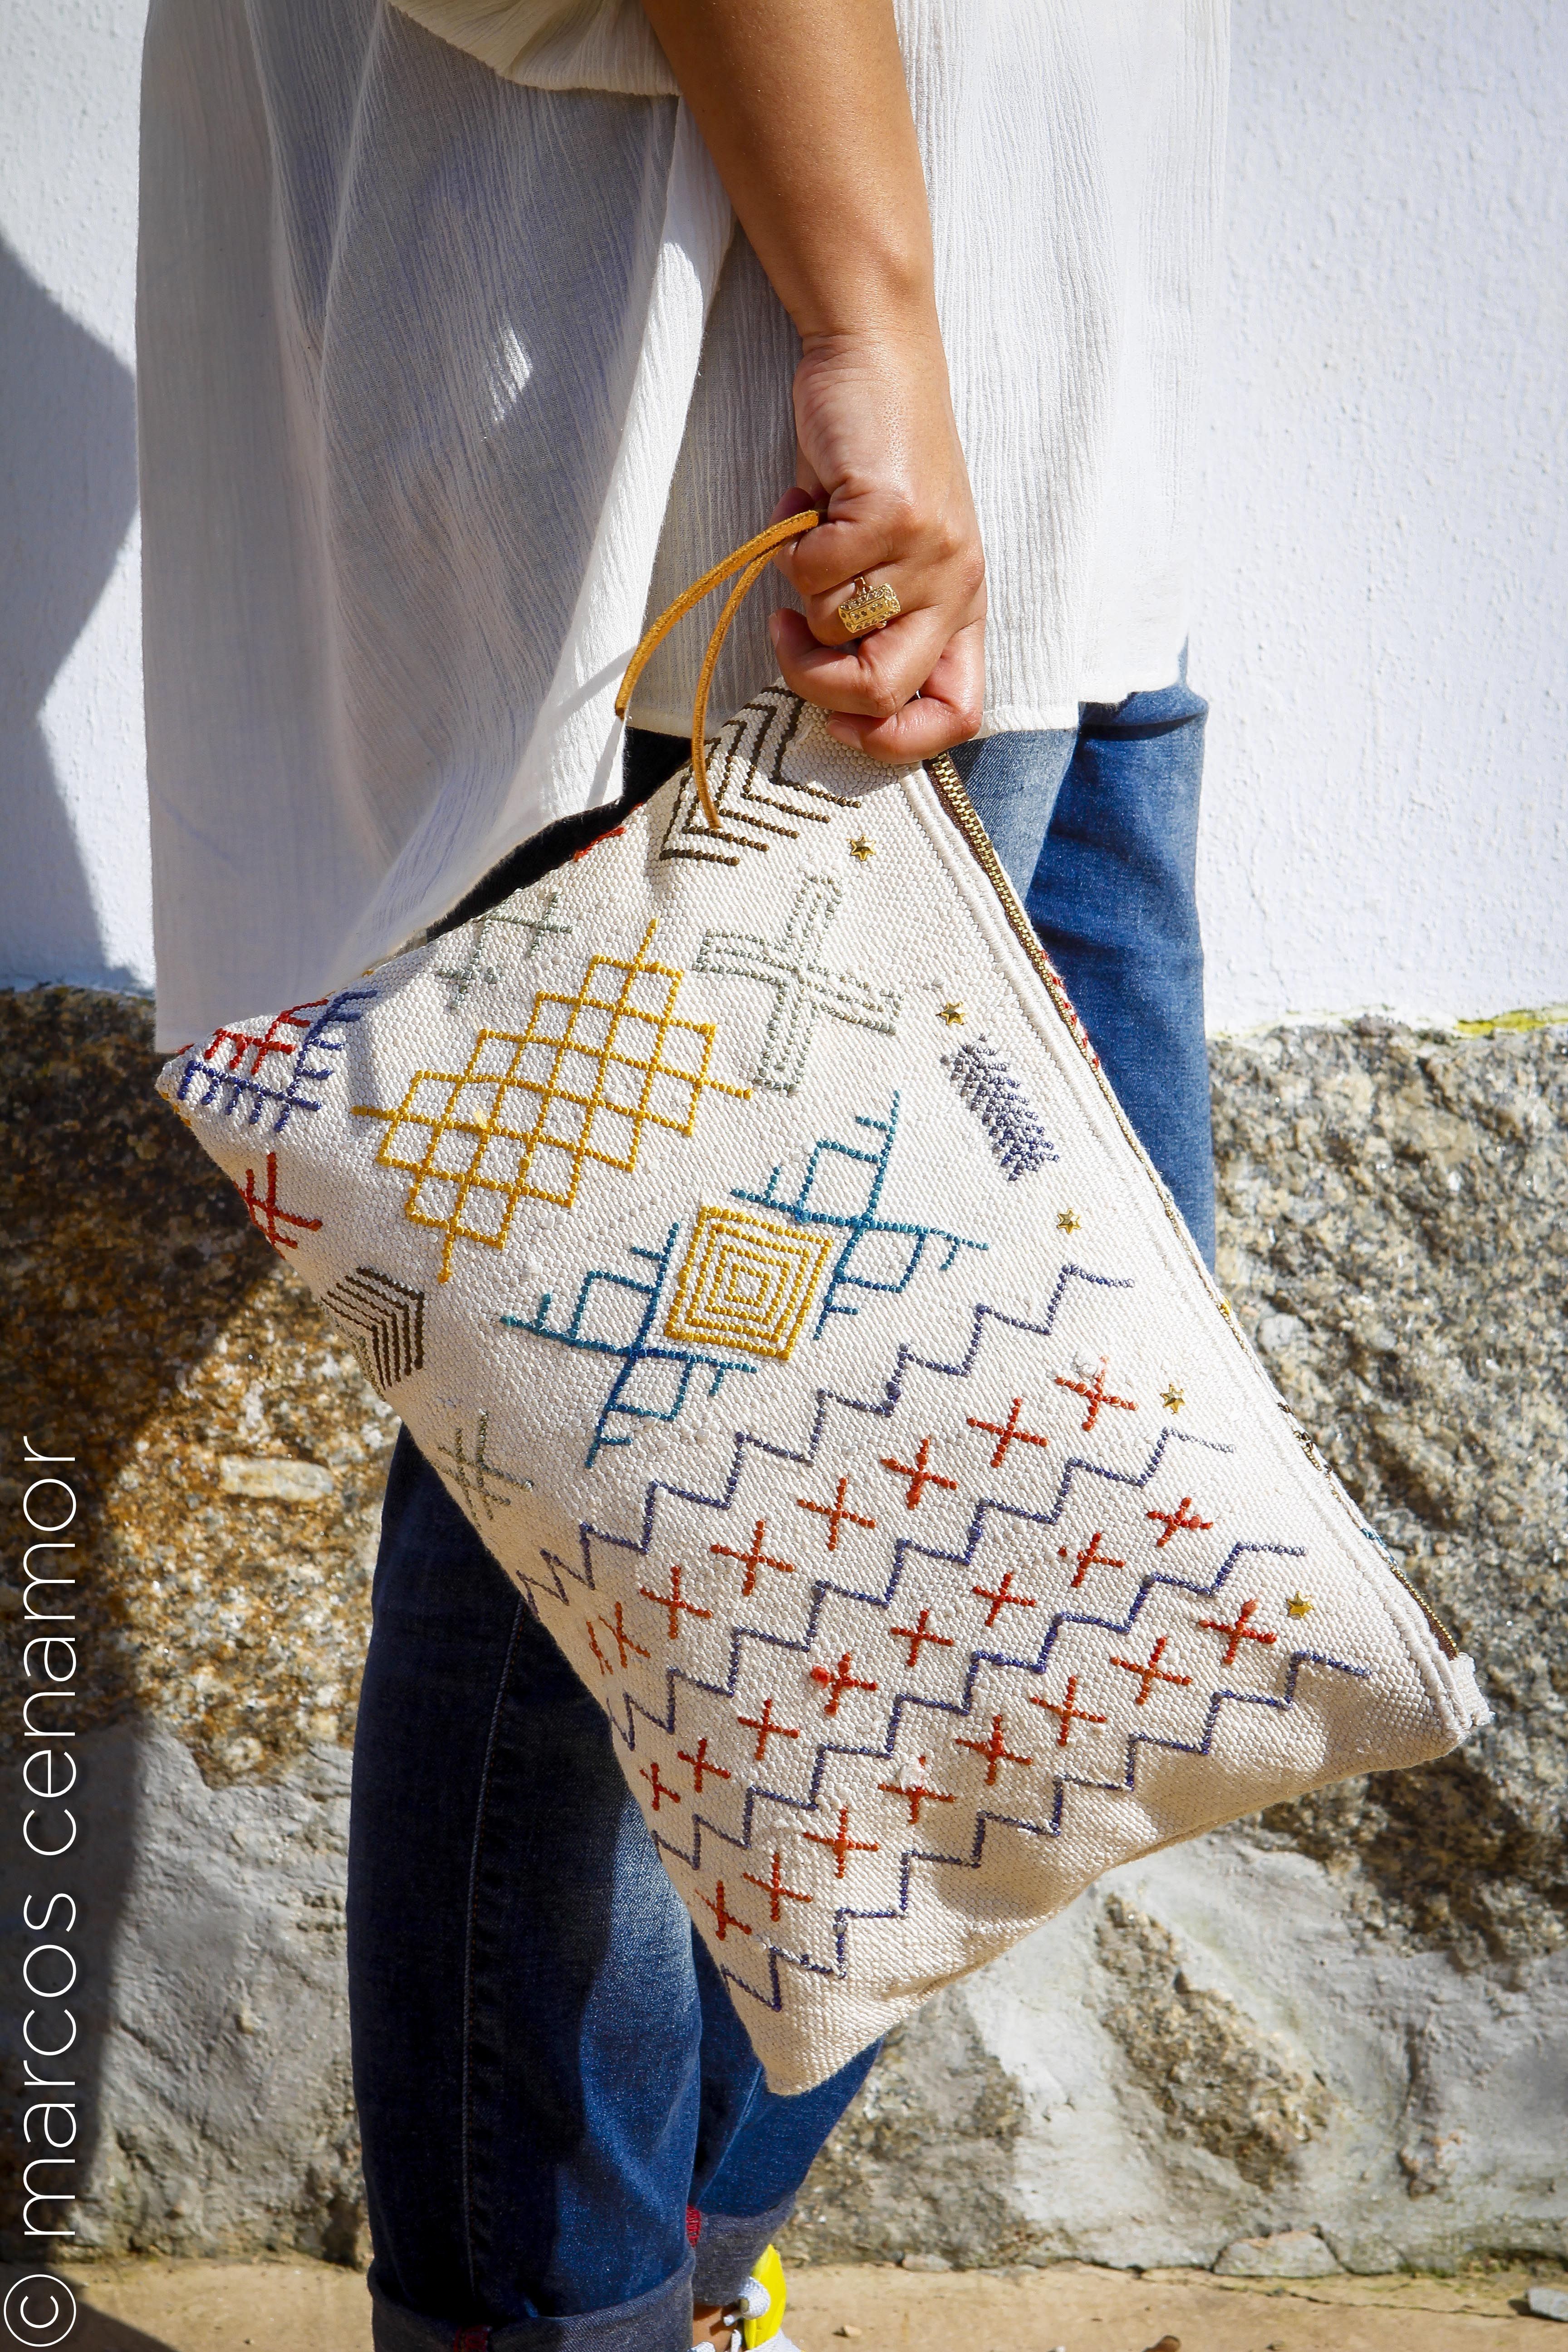 bolso elaborado de forma artesanal con tejido de tapiz bereber realizado a mano en marruecos